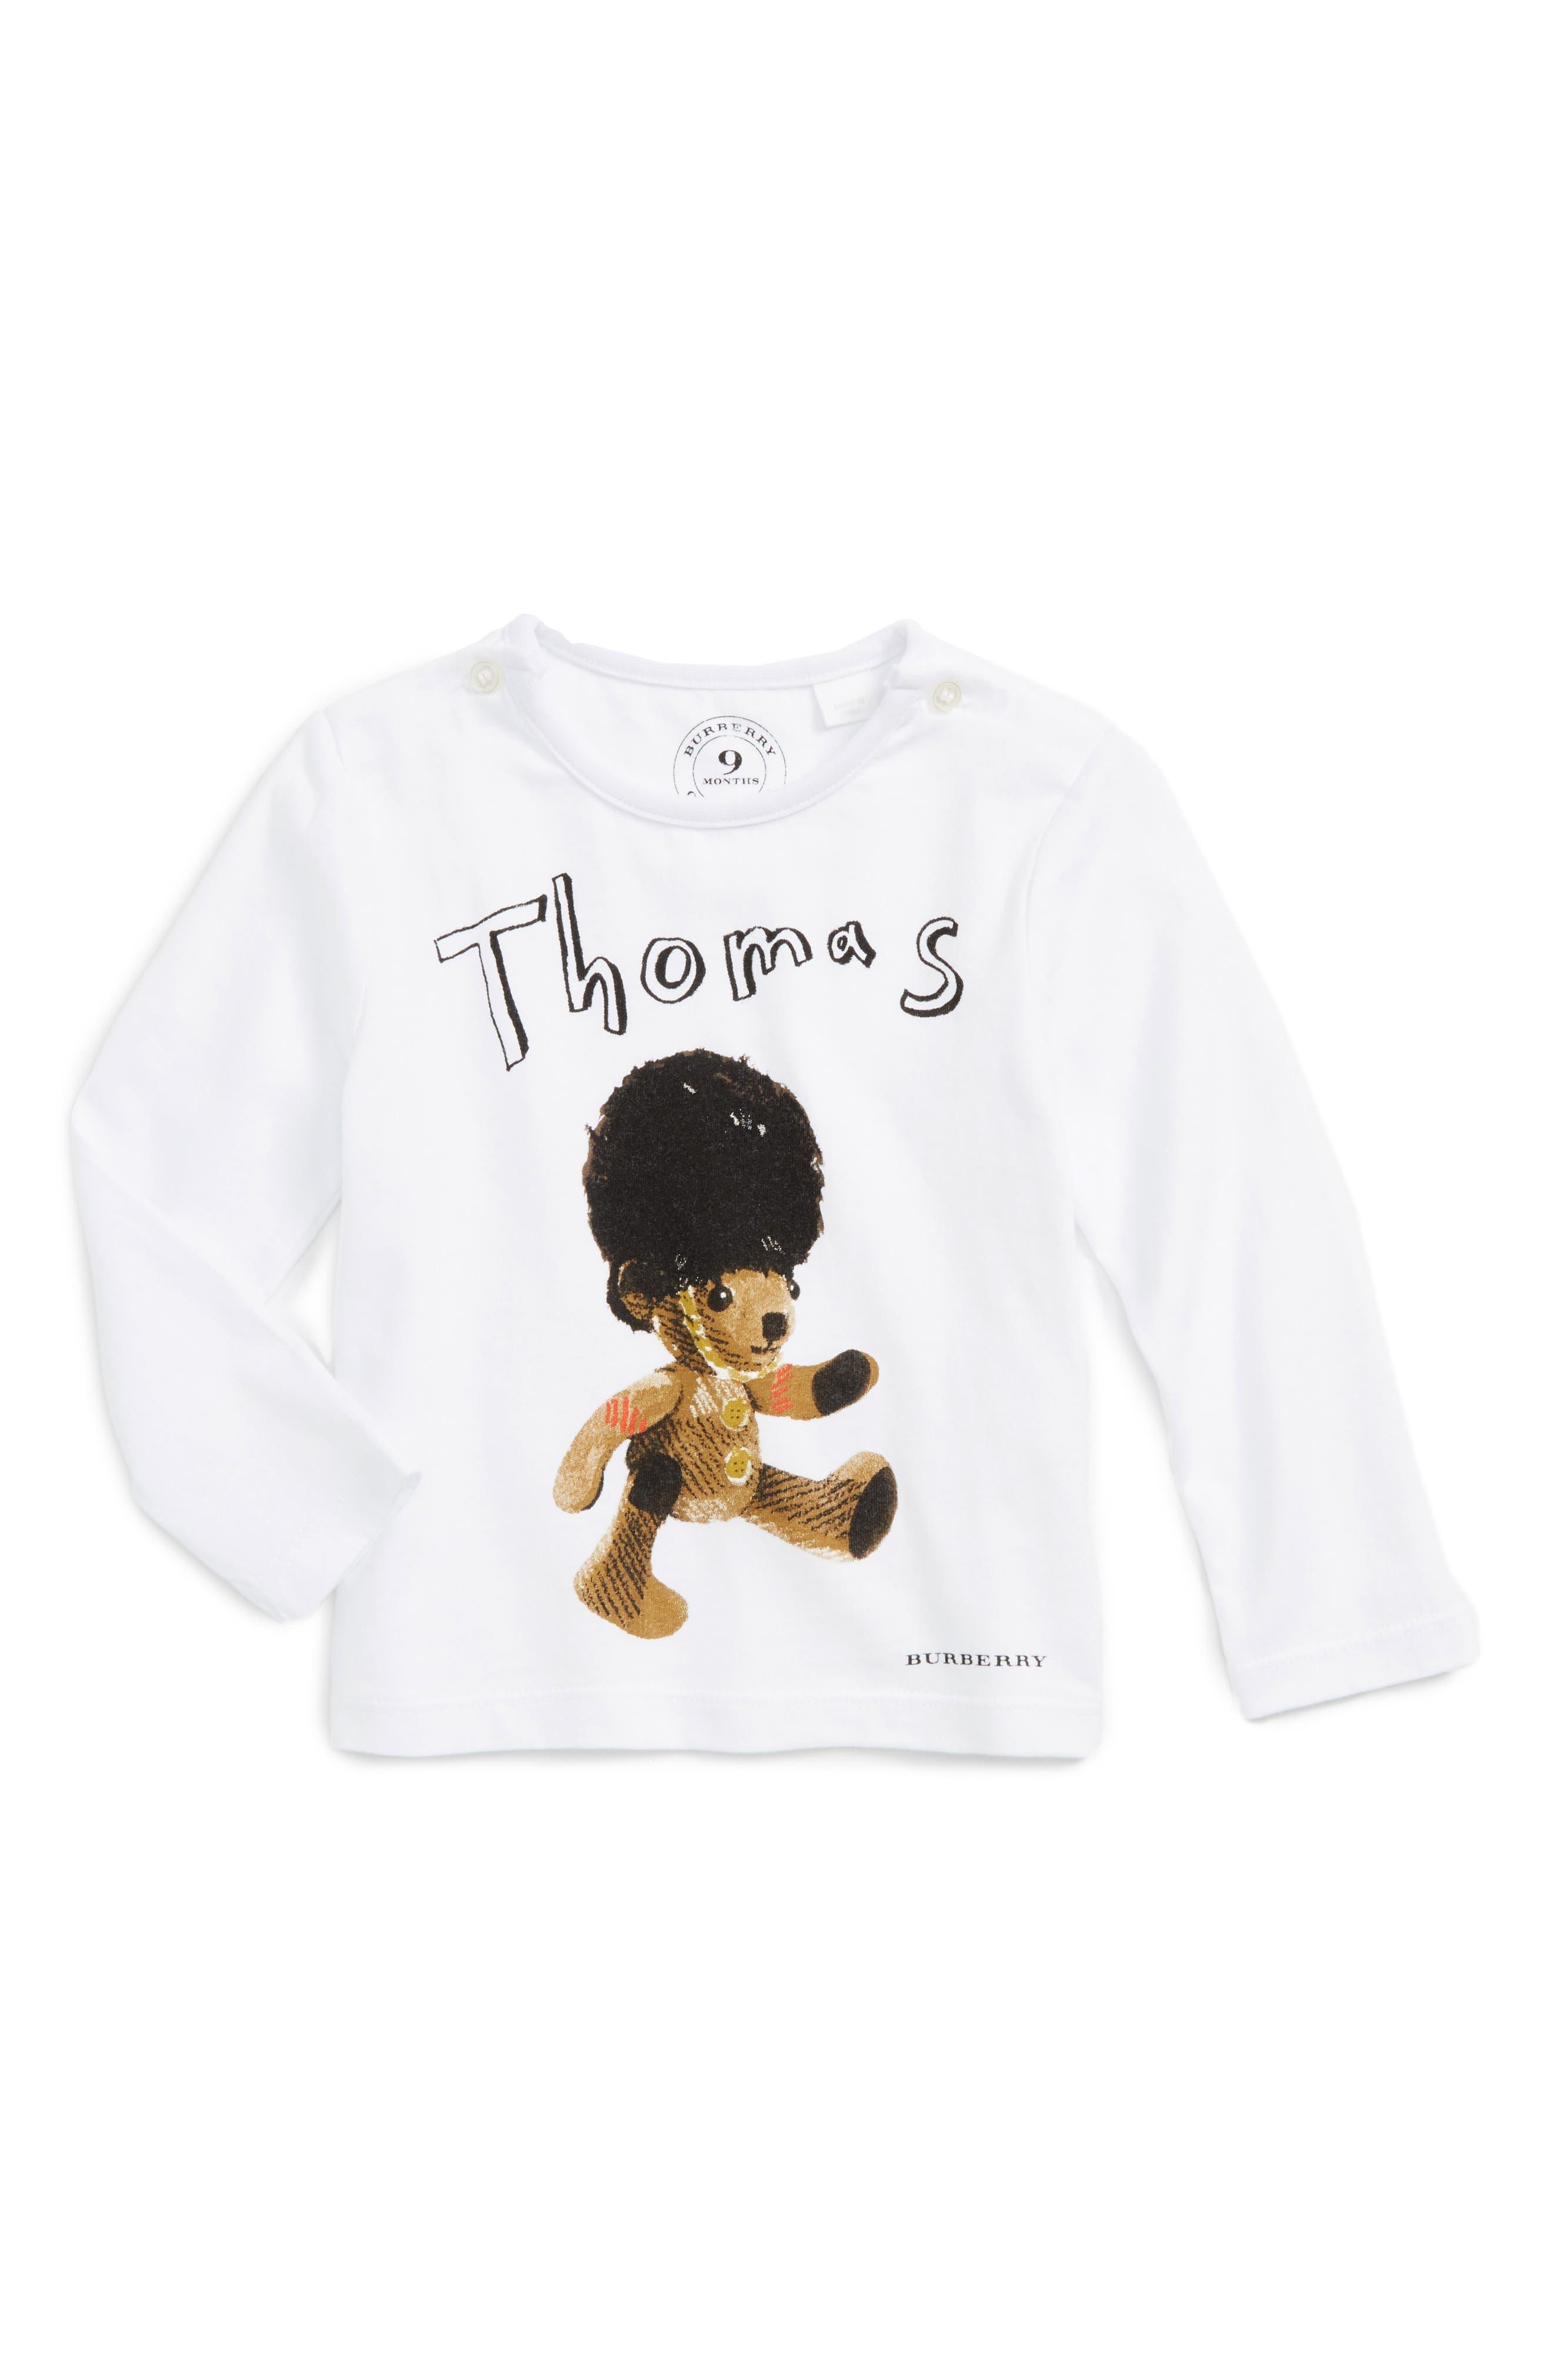 Burberry Thomas Bear Graphic T-Shirt (Baby Boys)